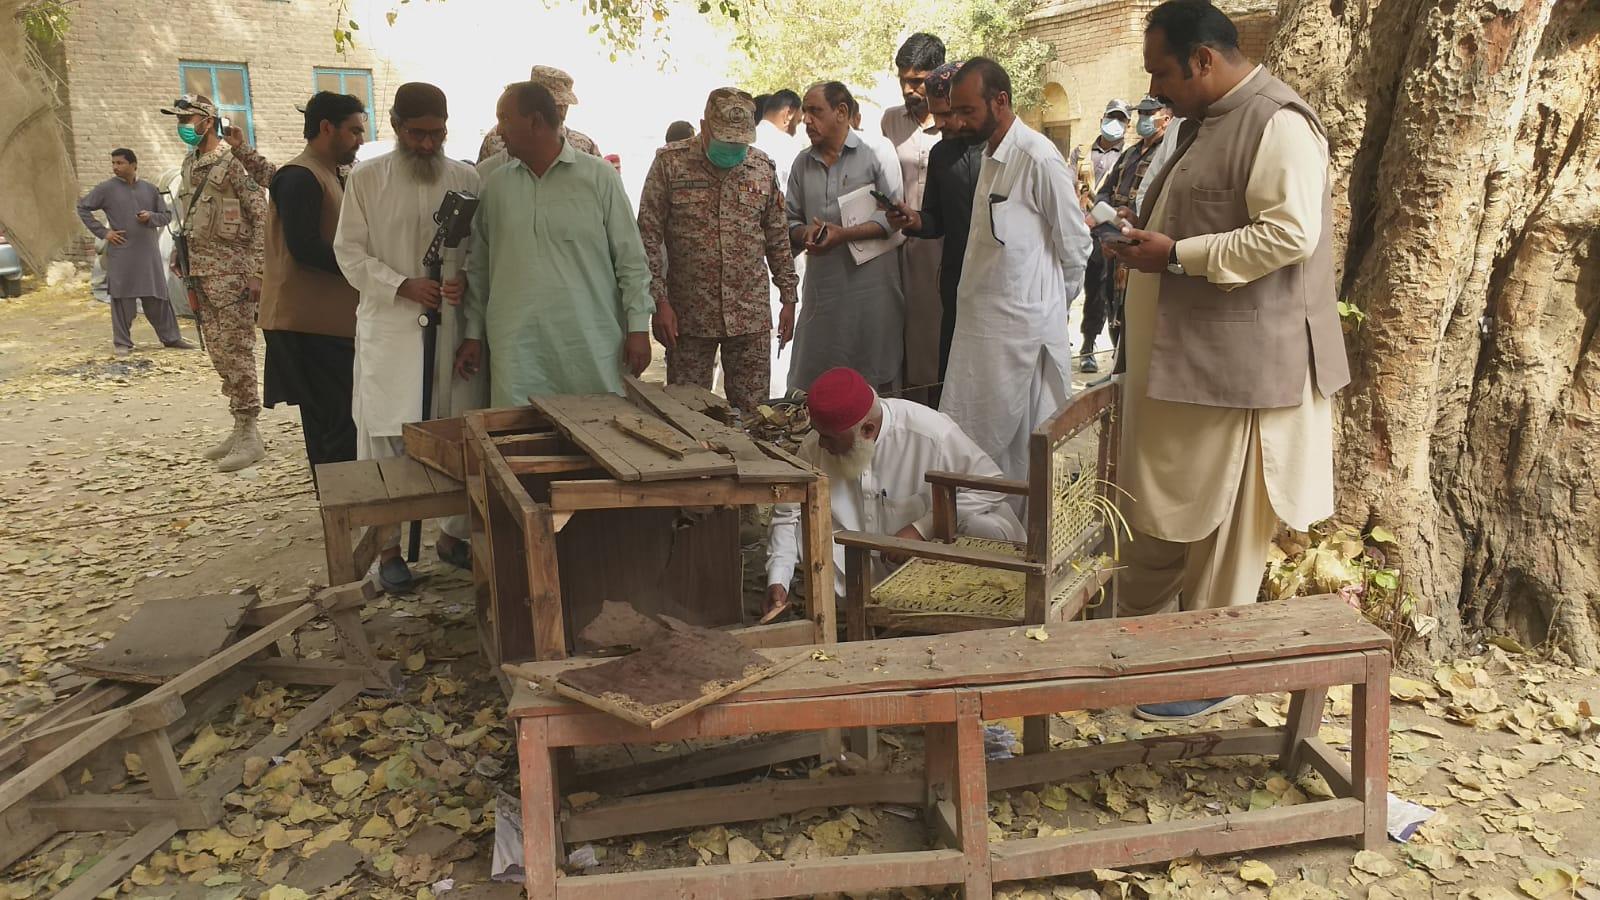 Ubauro Blast - Explosive material was sold to children as 'cracker' - Sindh Courier-2